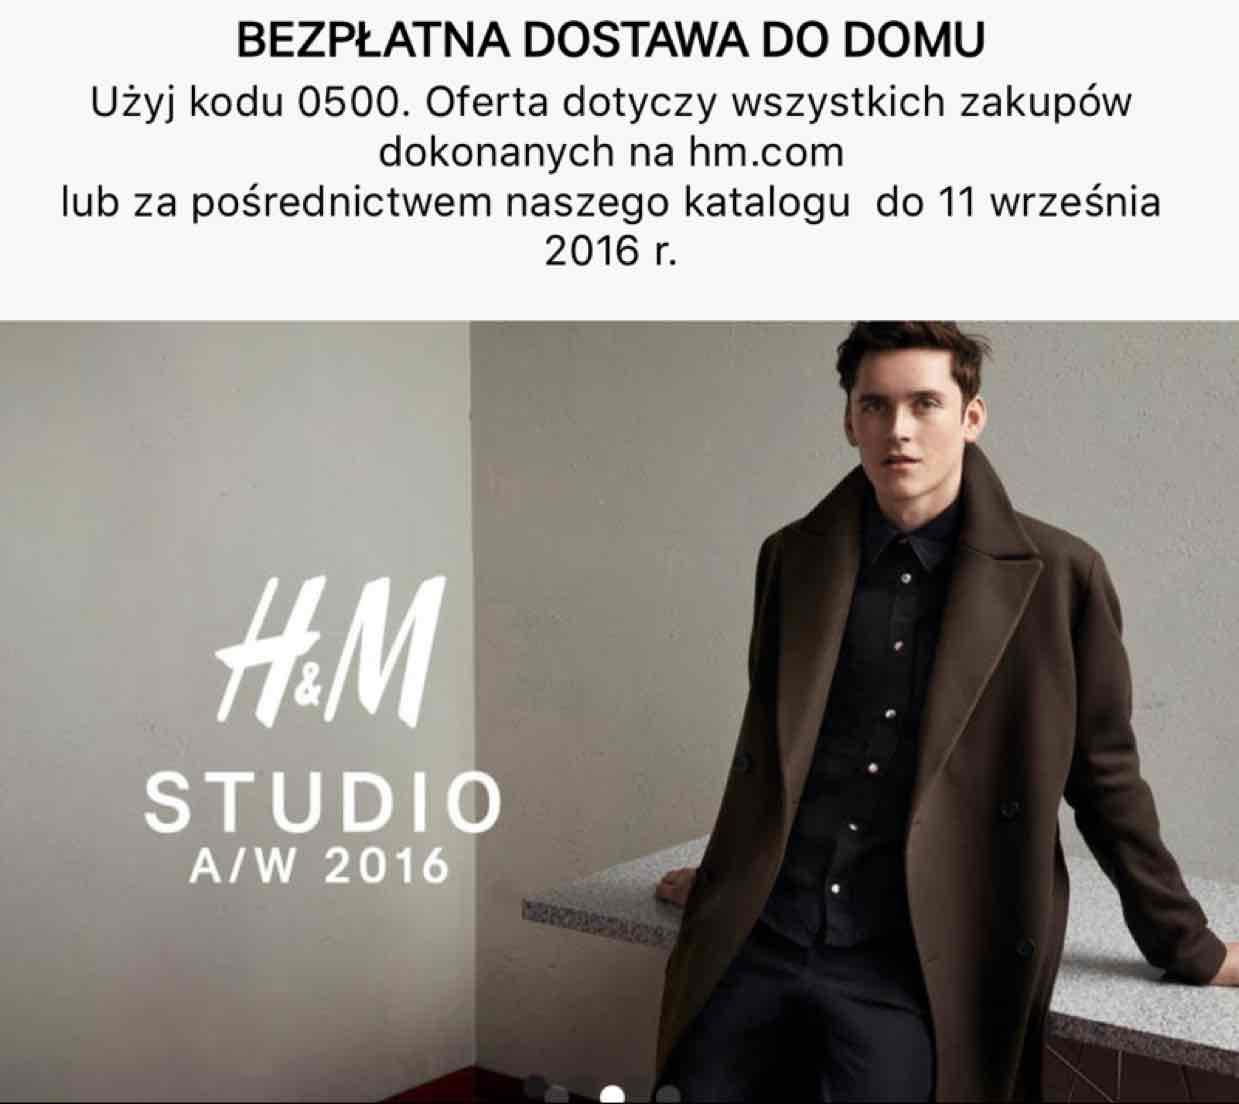 H&M bezpłatna dostawa do 11.09.2016 r.